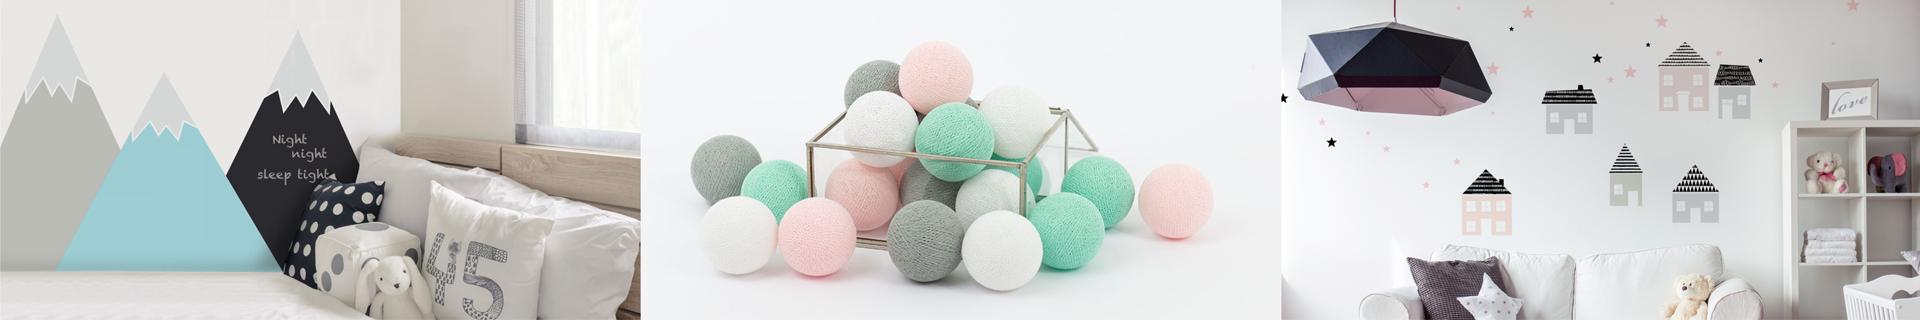 Cotton Balls - My Sweet Room - Meble dziecięce